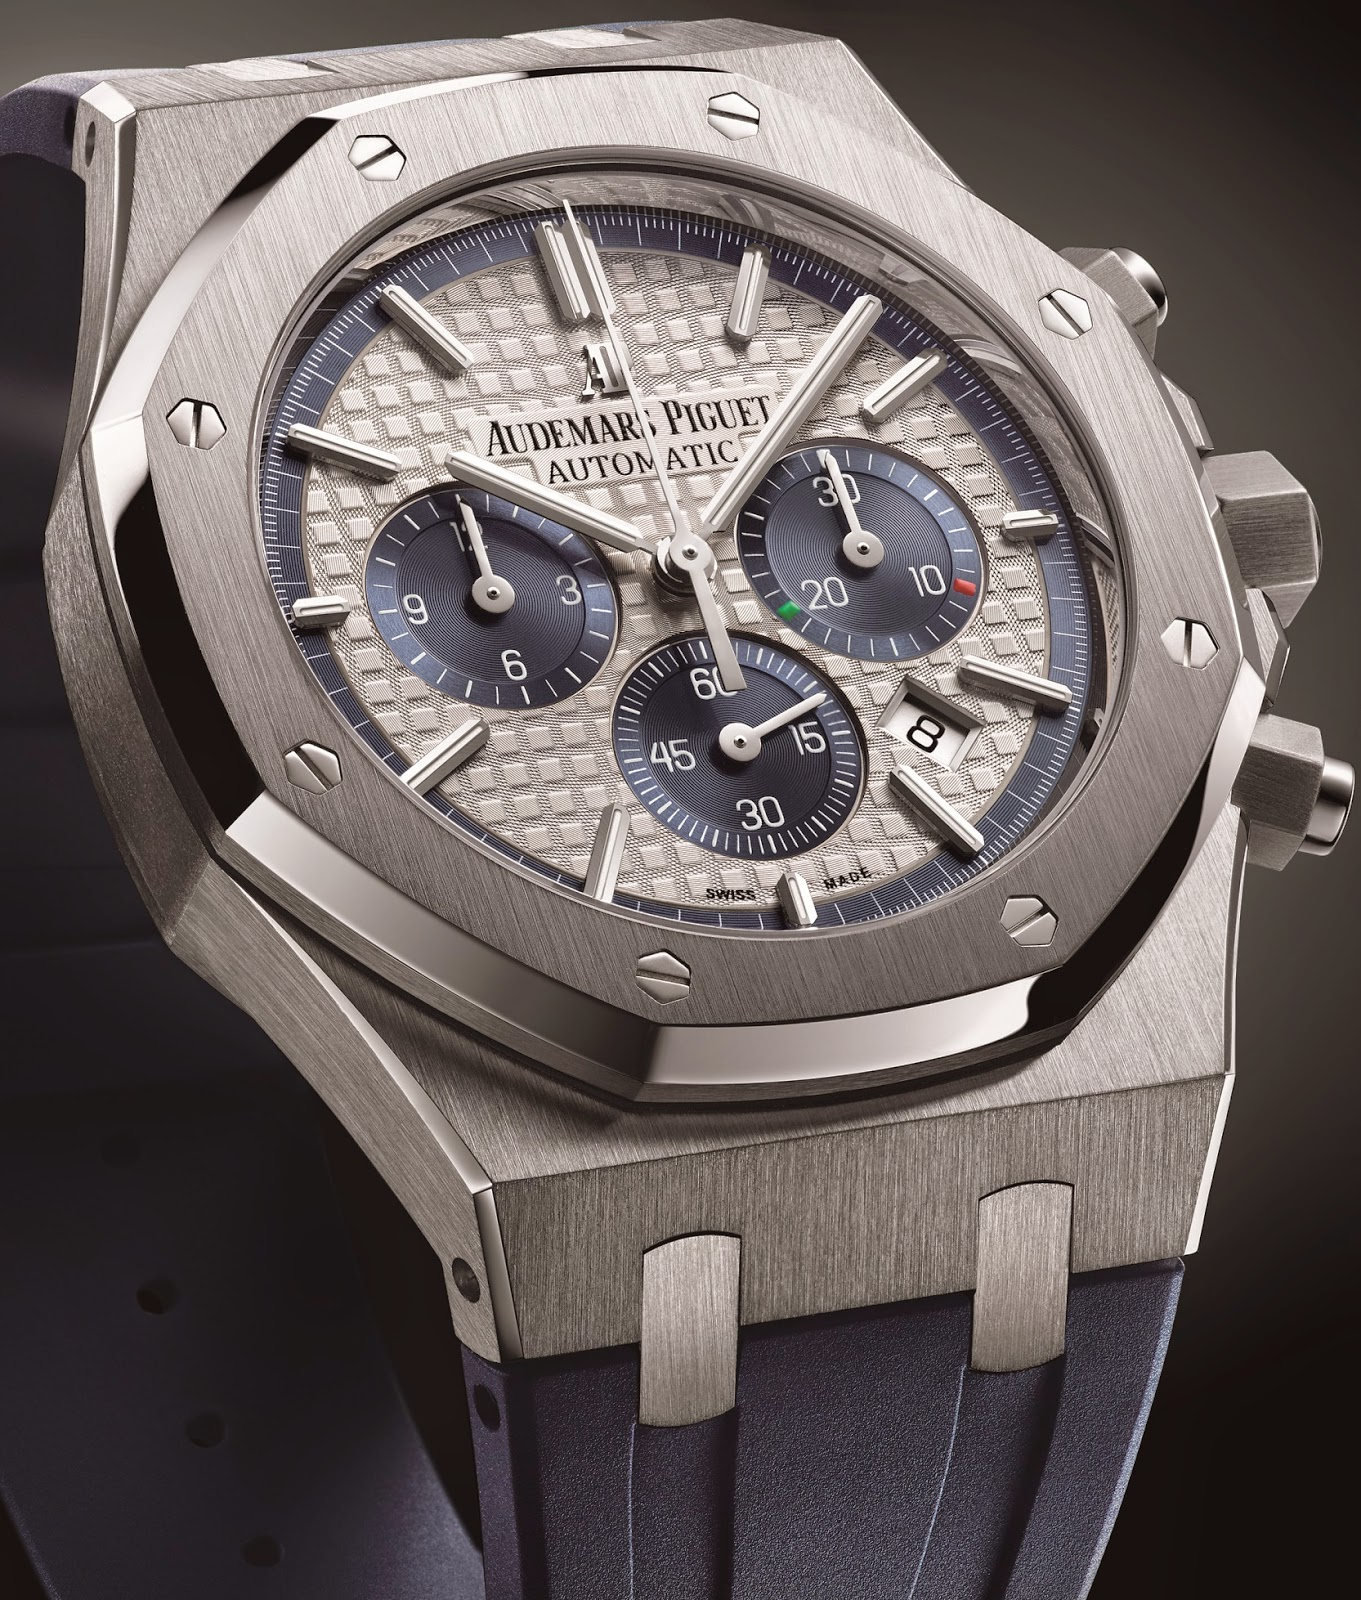 Audemars Piguet - Royal Oak Chronograph in Limited Edition